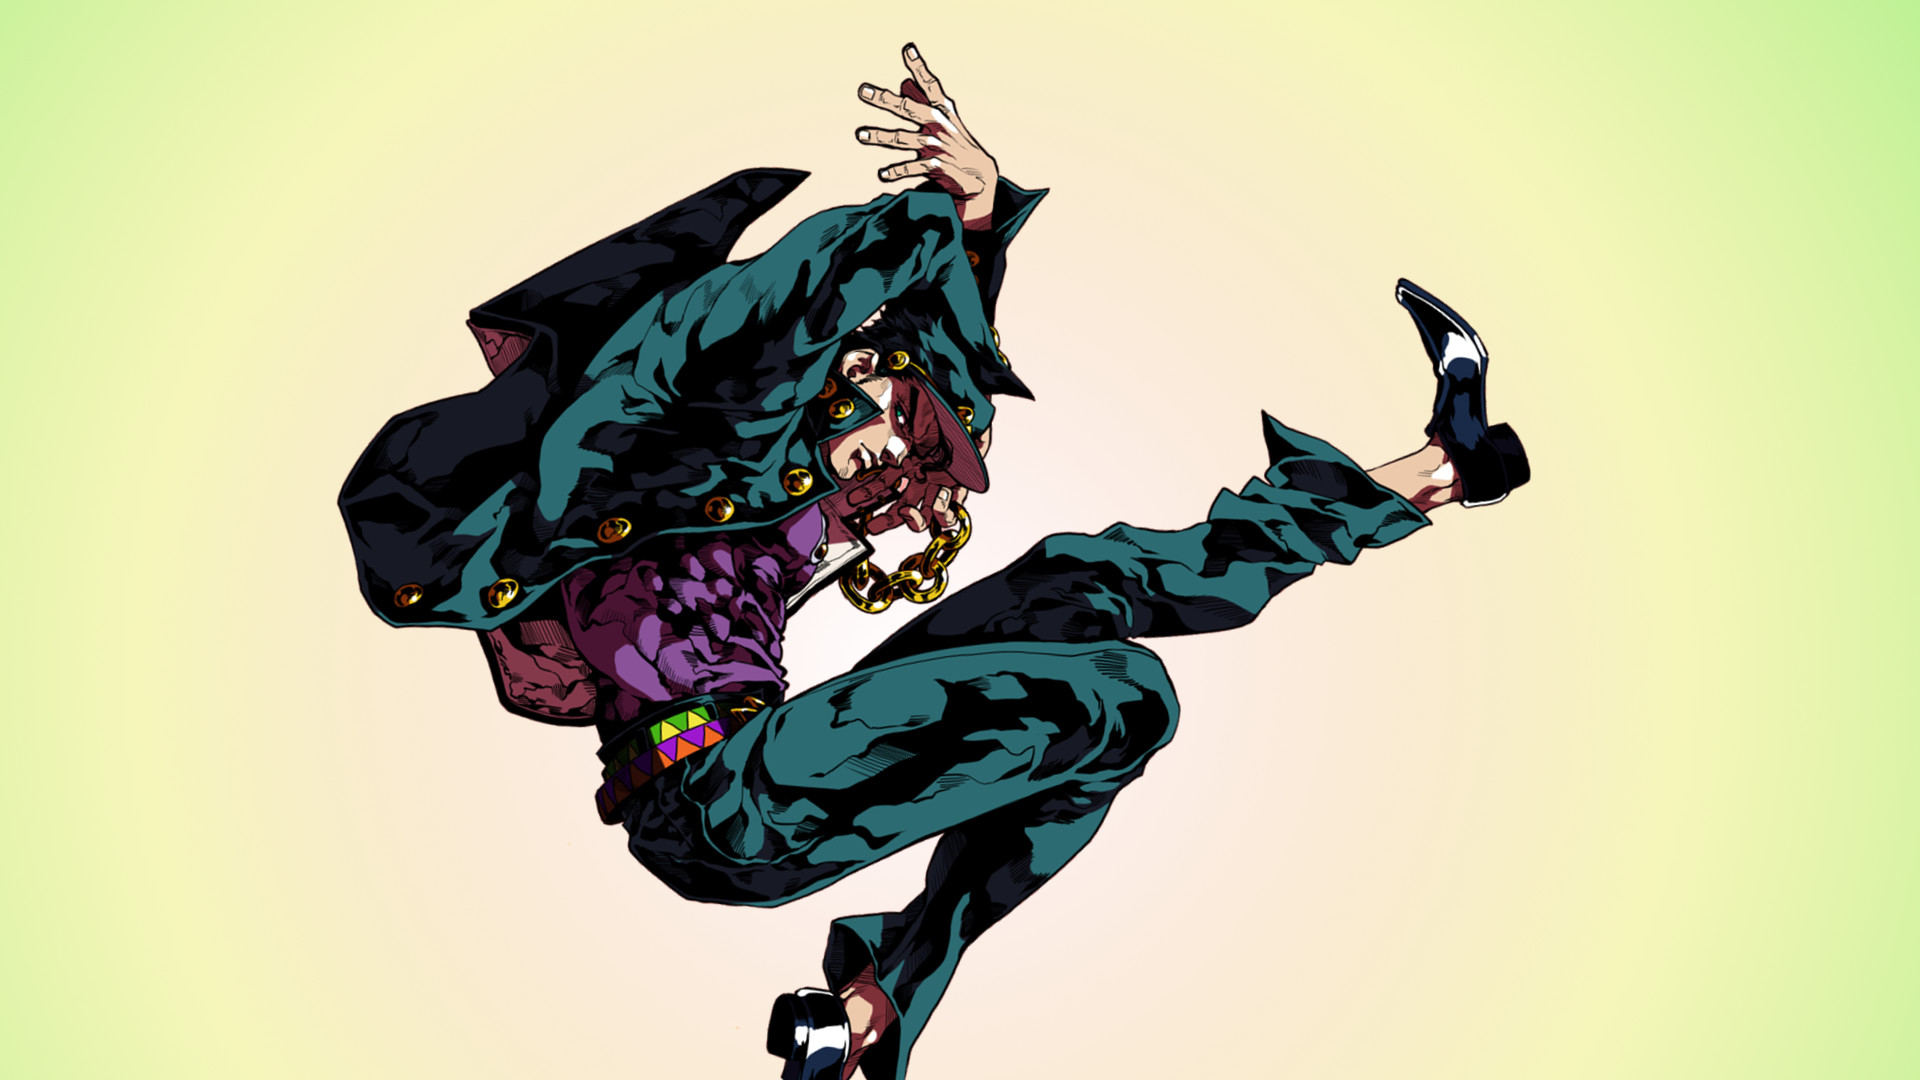 JoJo's Bizarre Adventure | Pinterest | Wallpaper and Anime